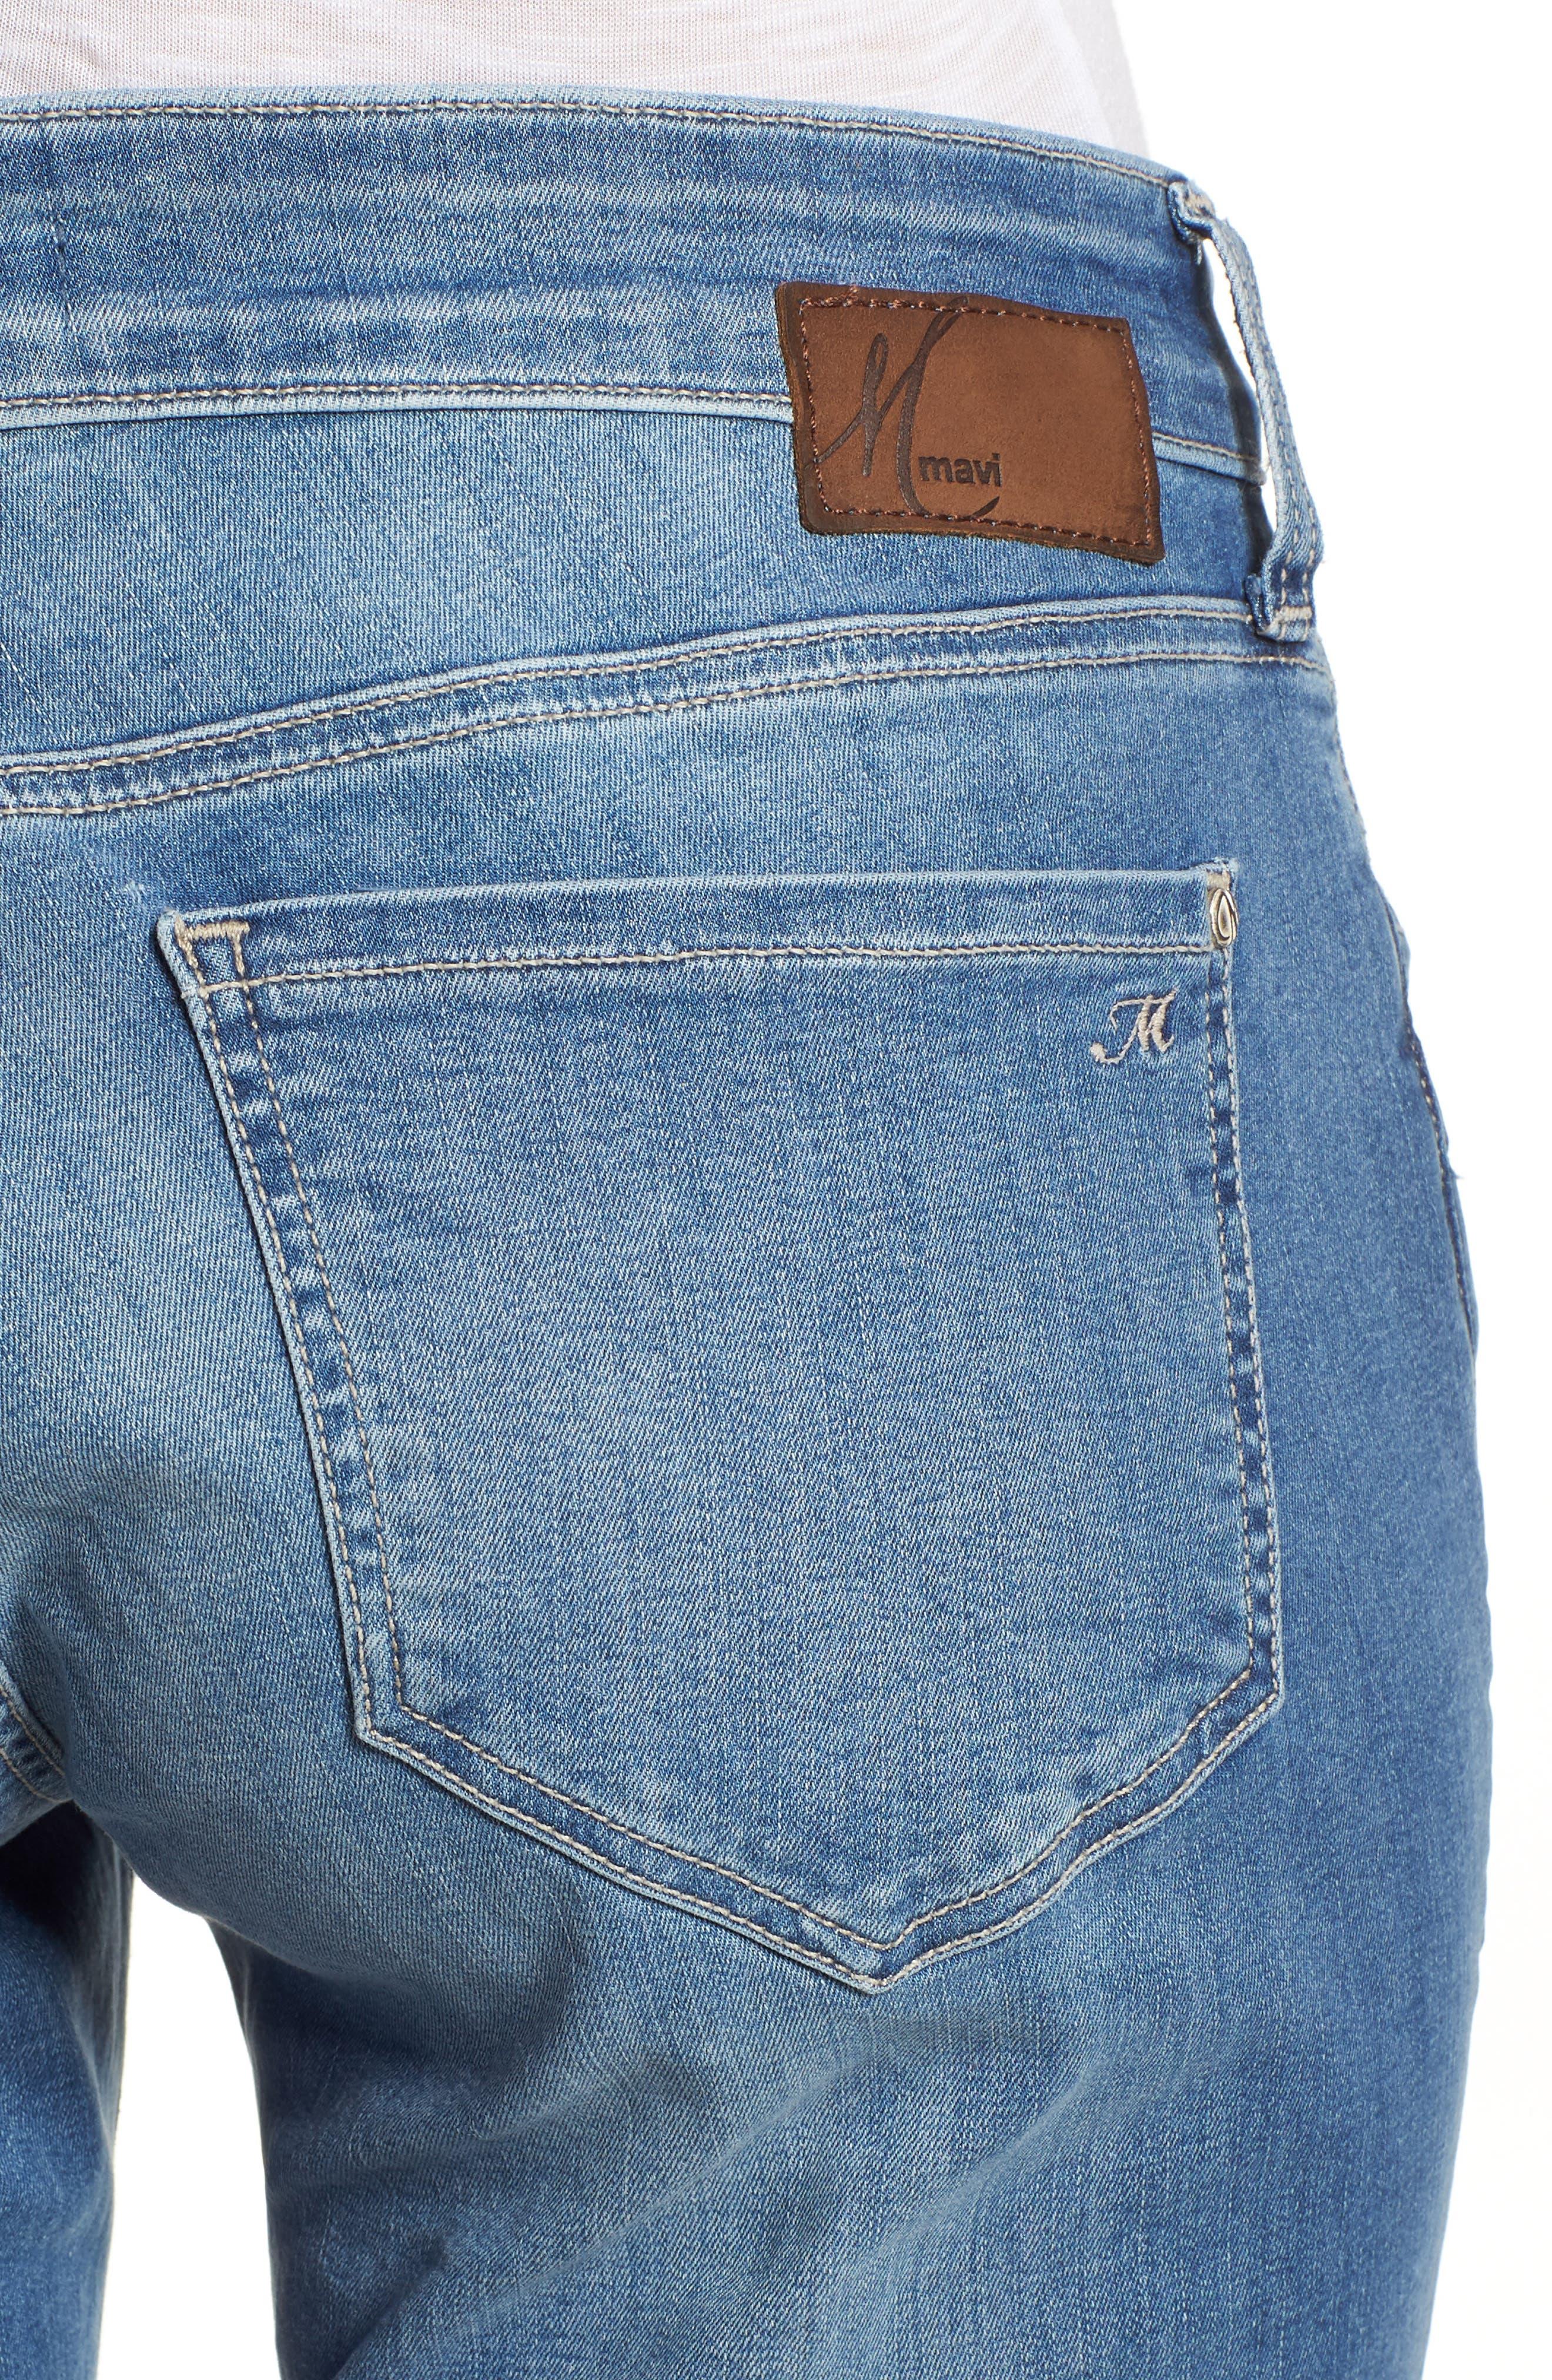 Emma Slim Boyfriend Jeans,                             Alternate thumbnail 4, color,                             INDIGO RIPPED NOLITA